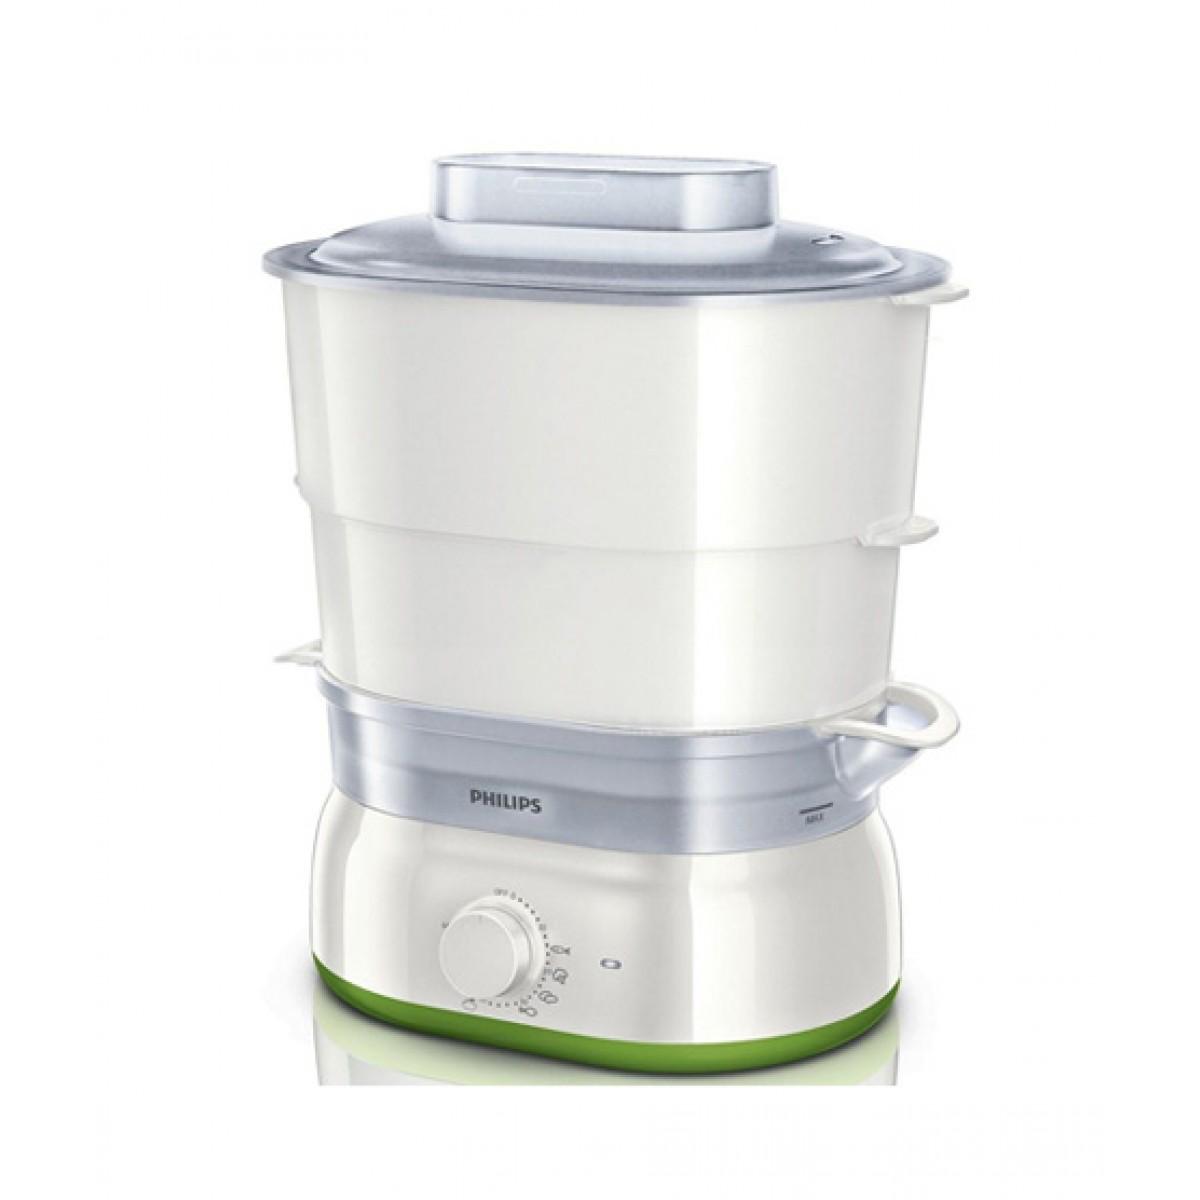 Philips Food Steamer (HD9104/00)